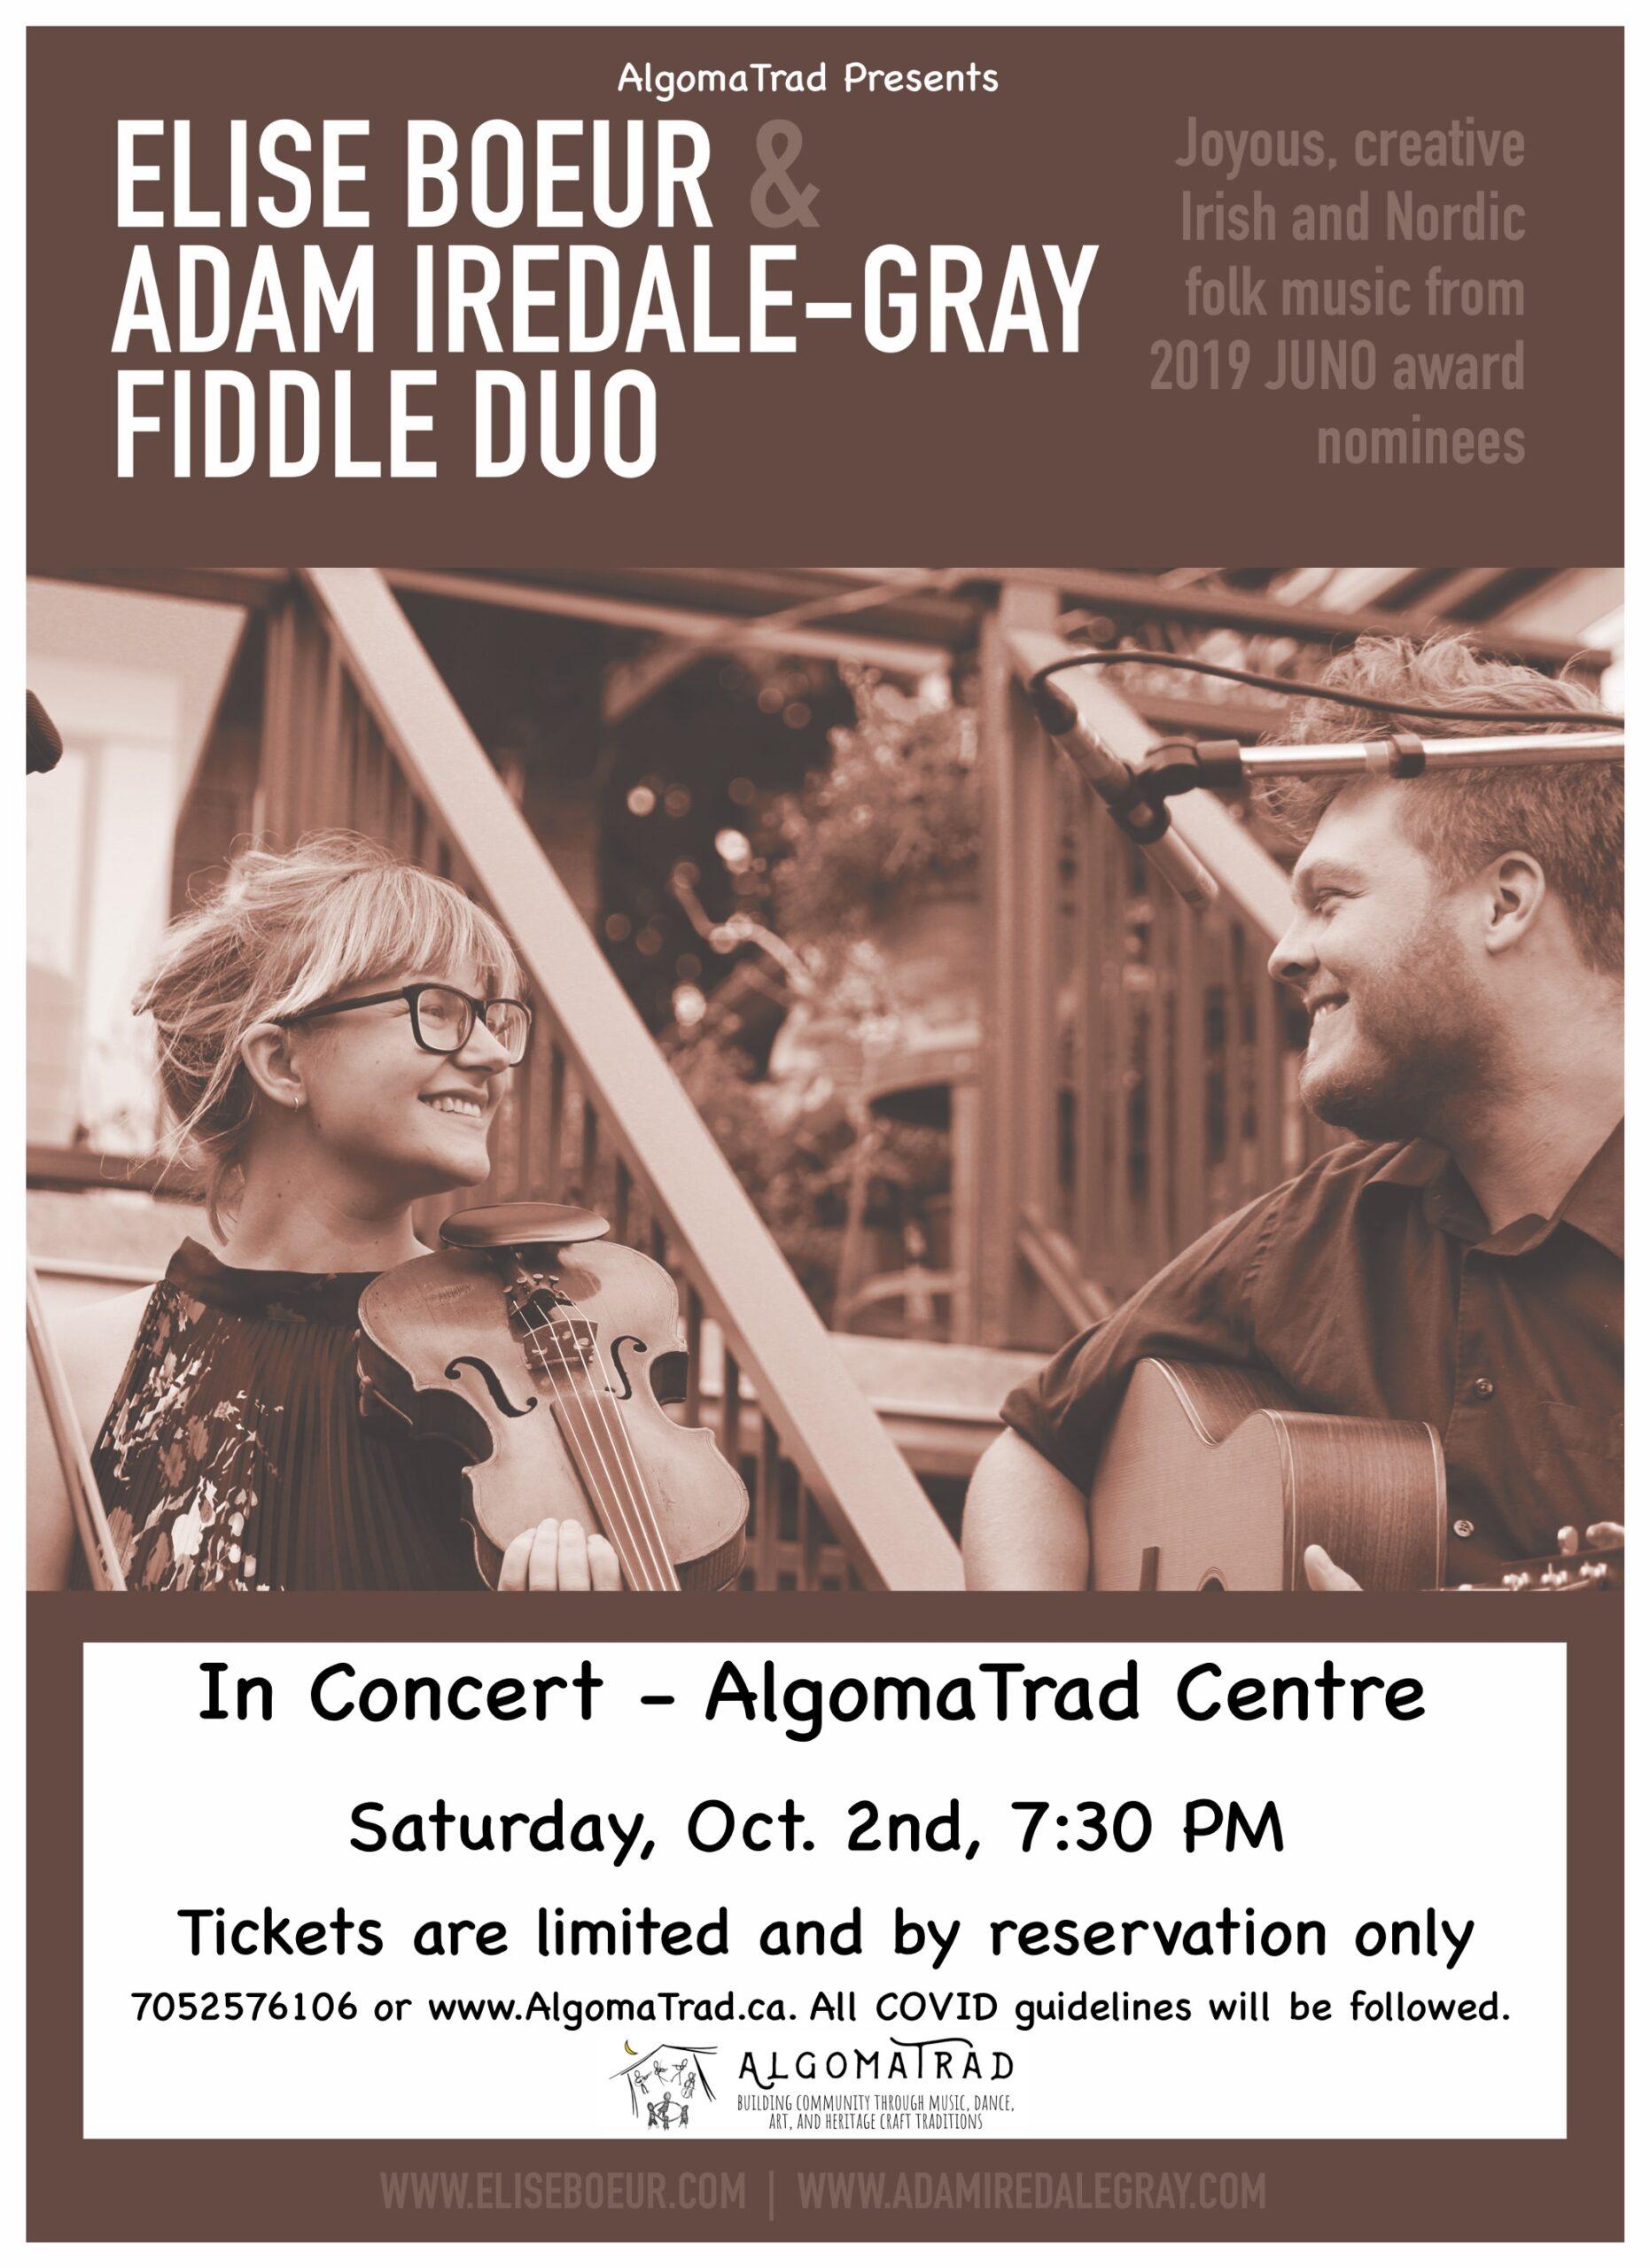 AlgomaTrad Presents Elise Bouer and Adam Iredale-Gray, Saturday, October 2